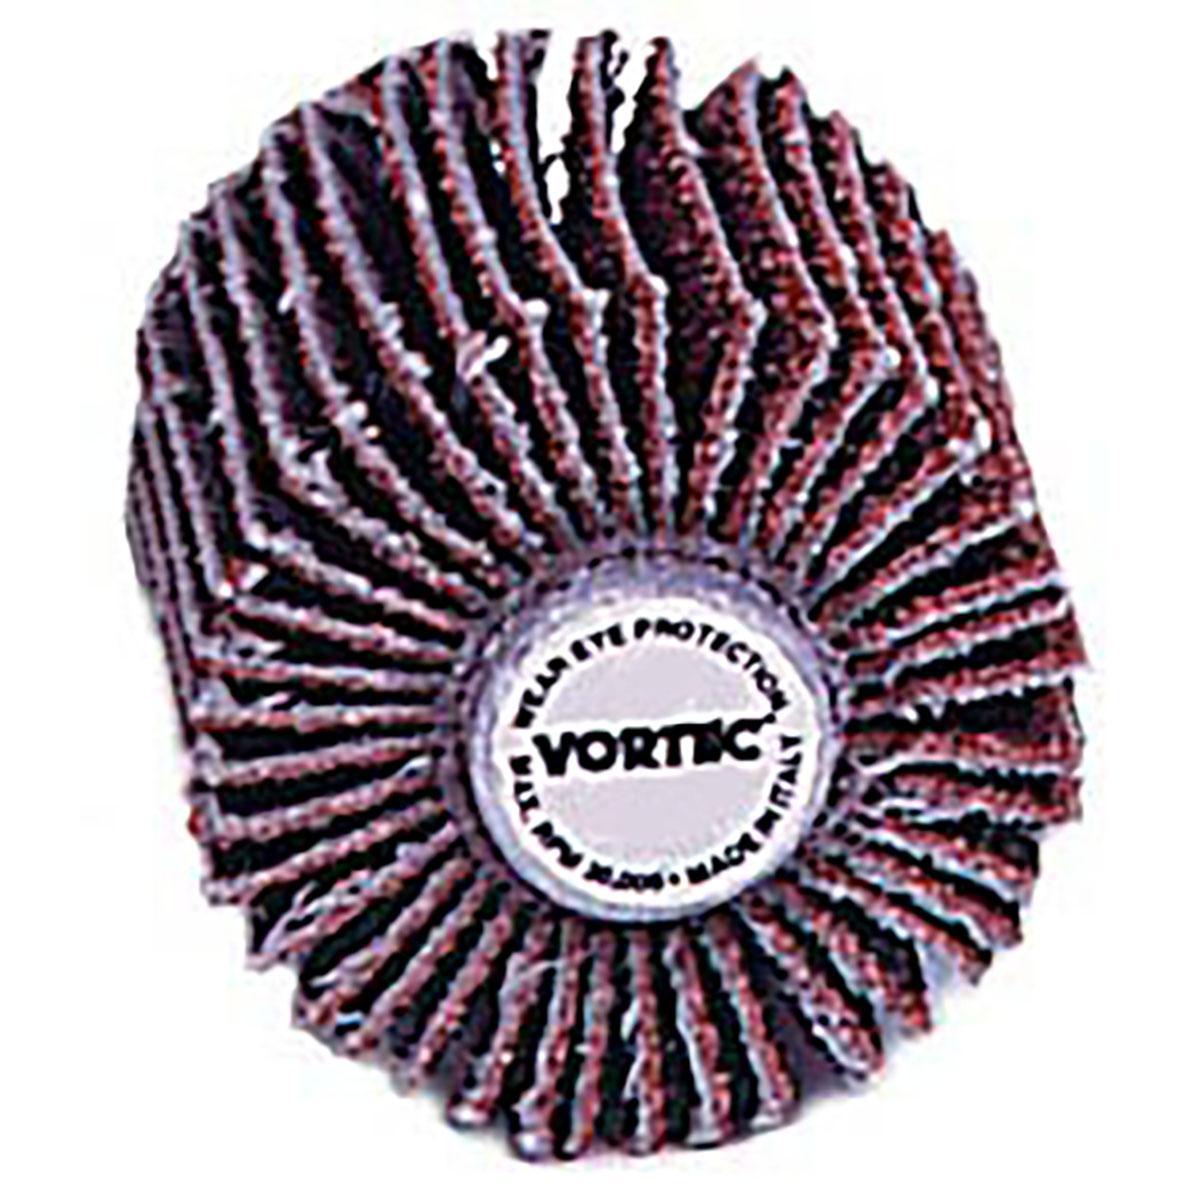 VFW-1X1X60 GRIT VORTEC